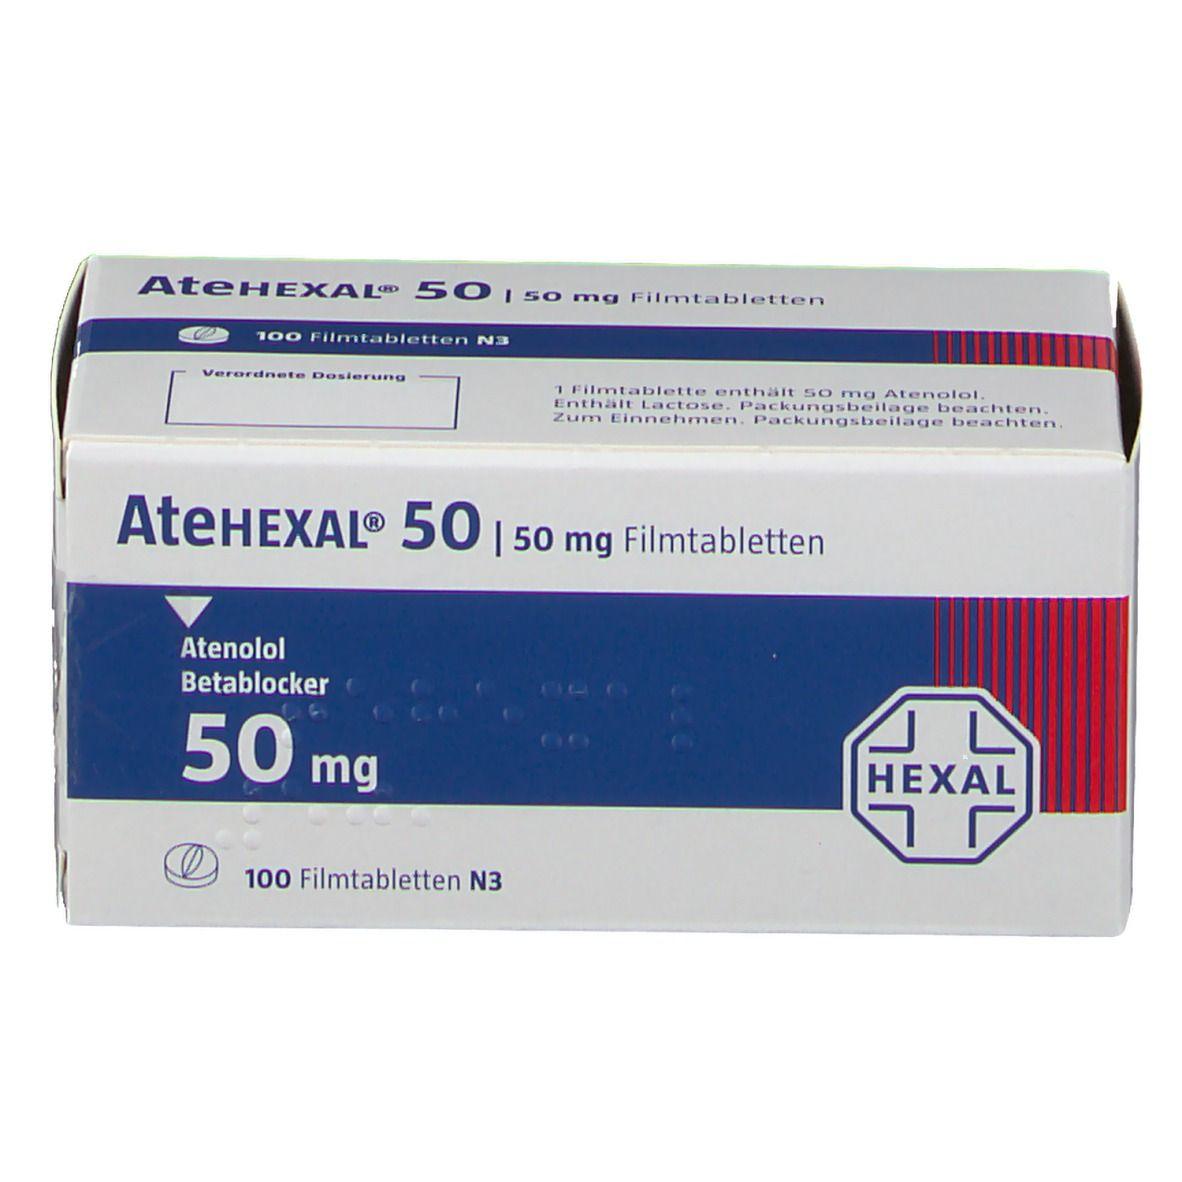 Atehexal 50 Filmtabletten